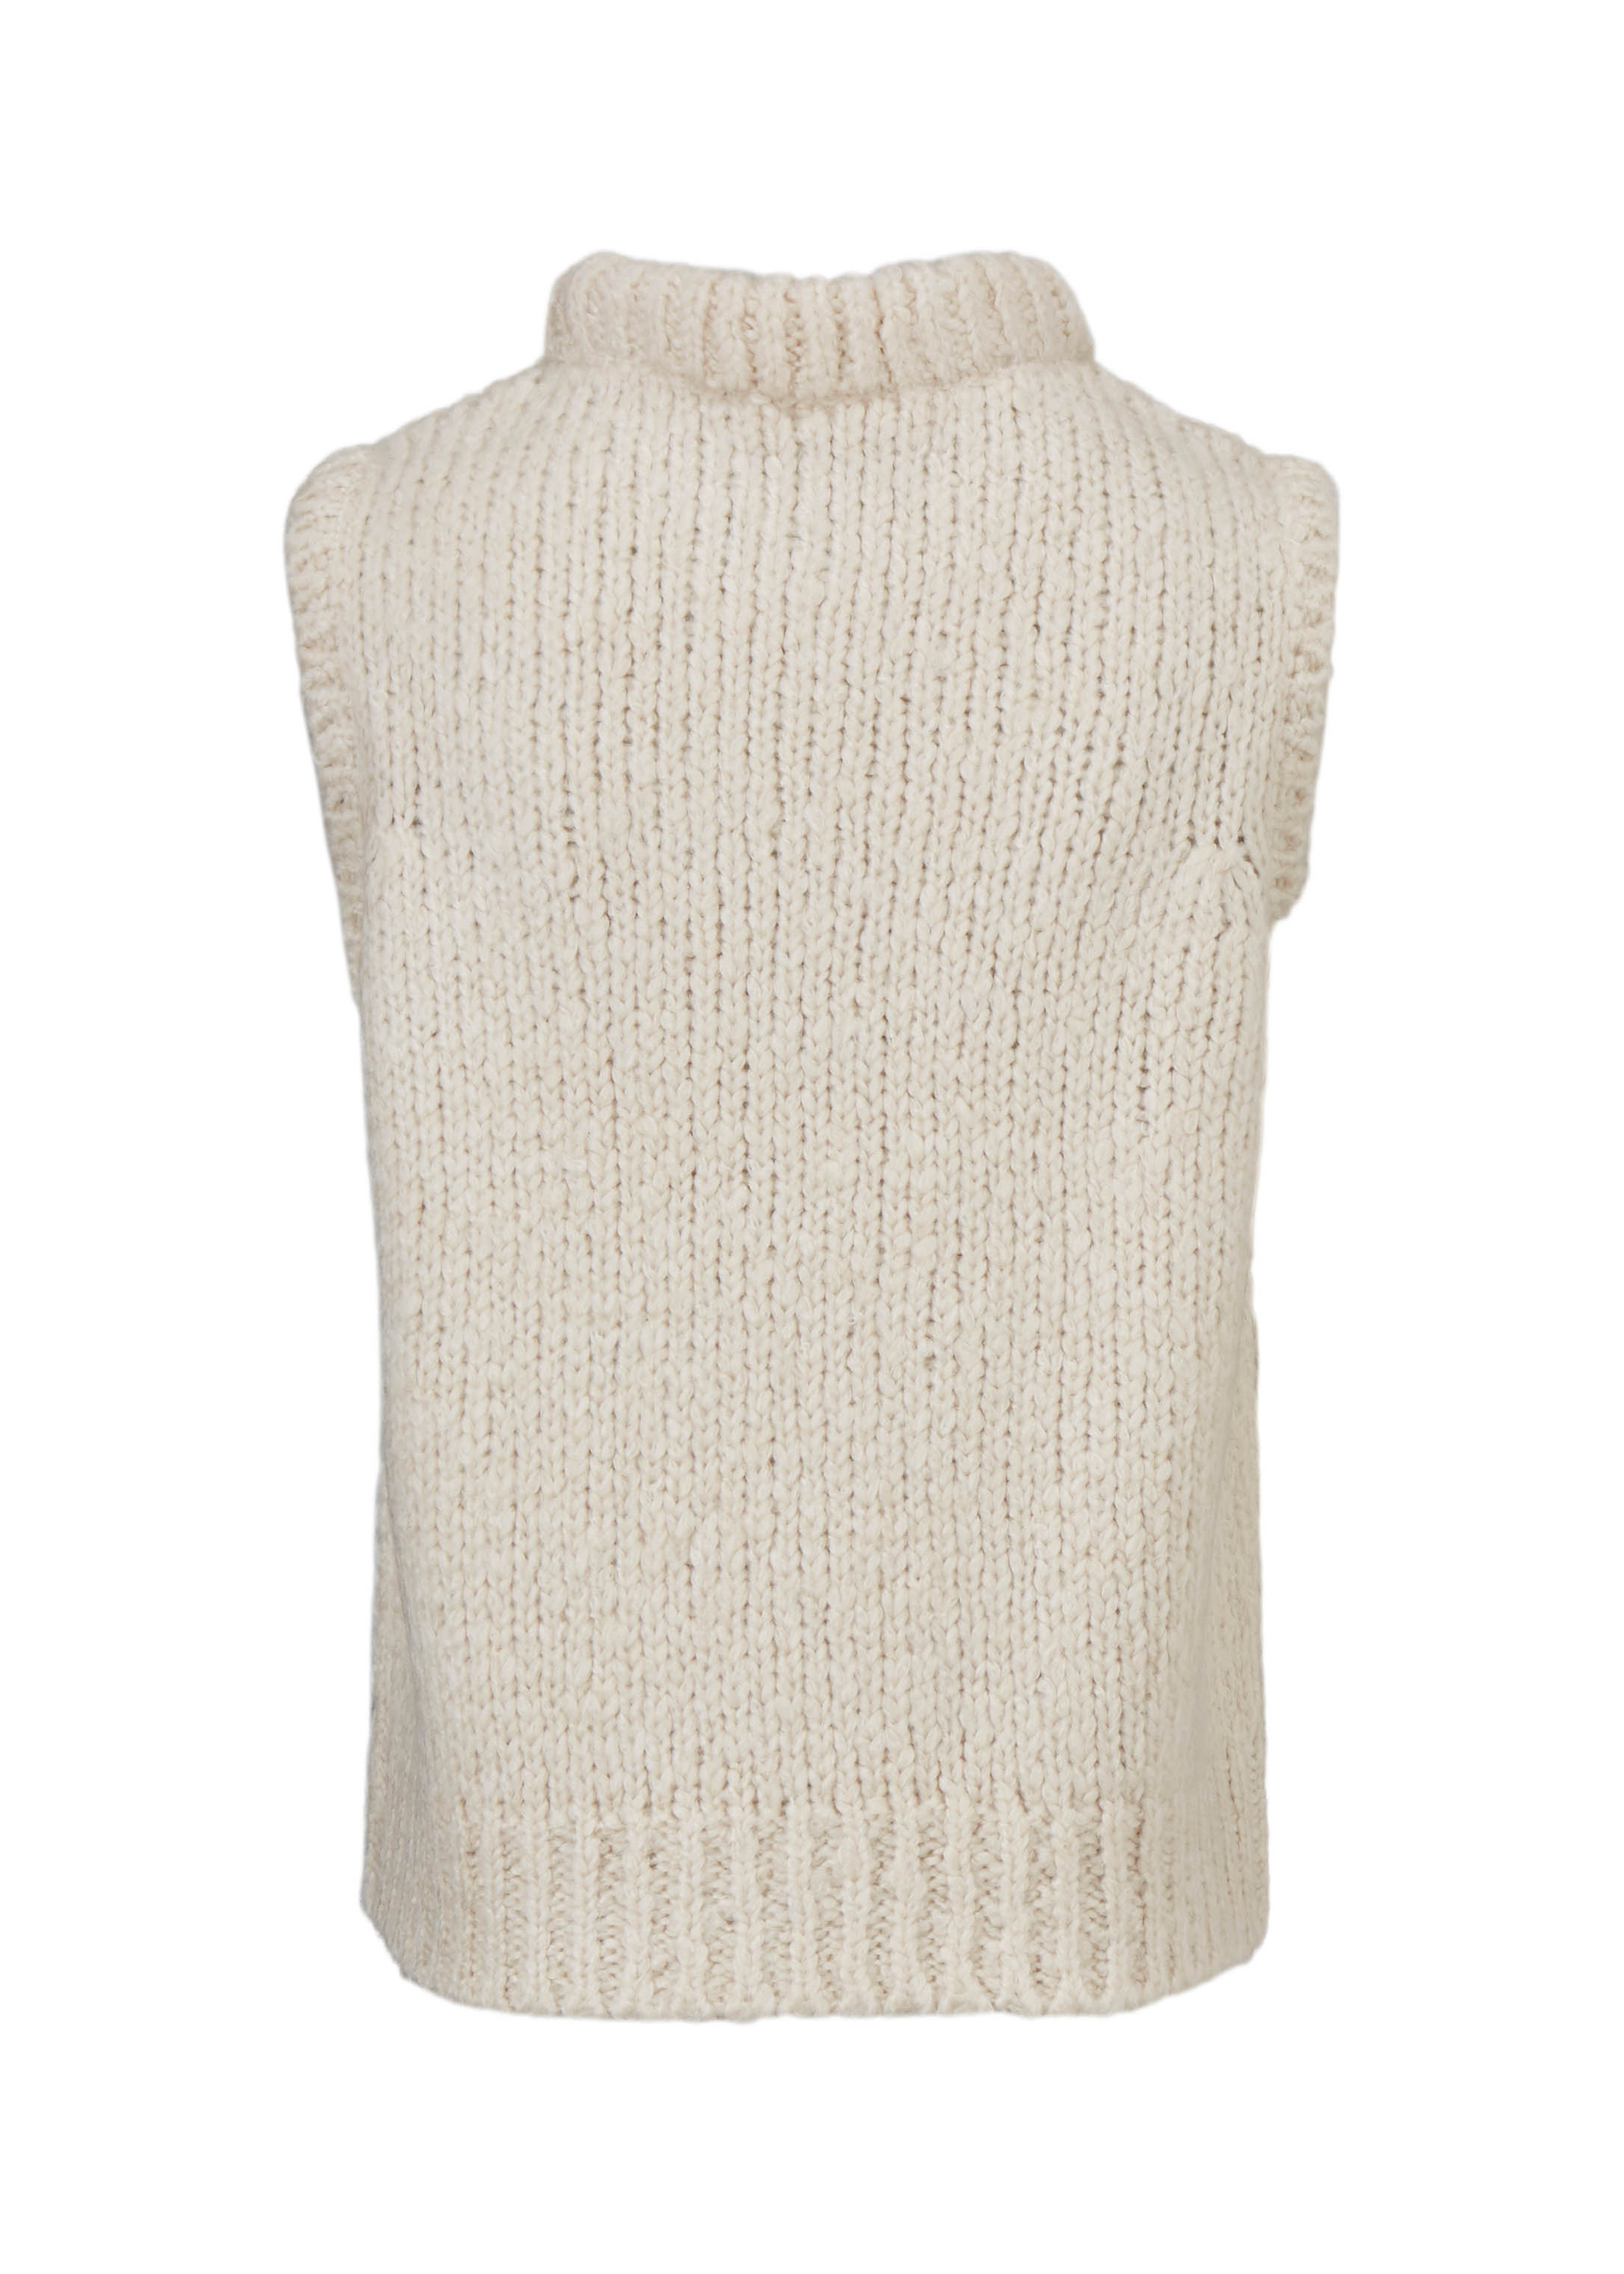 Modström Valentia vest, off-white, medium